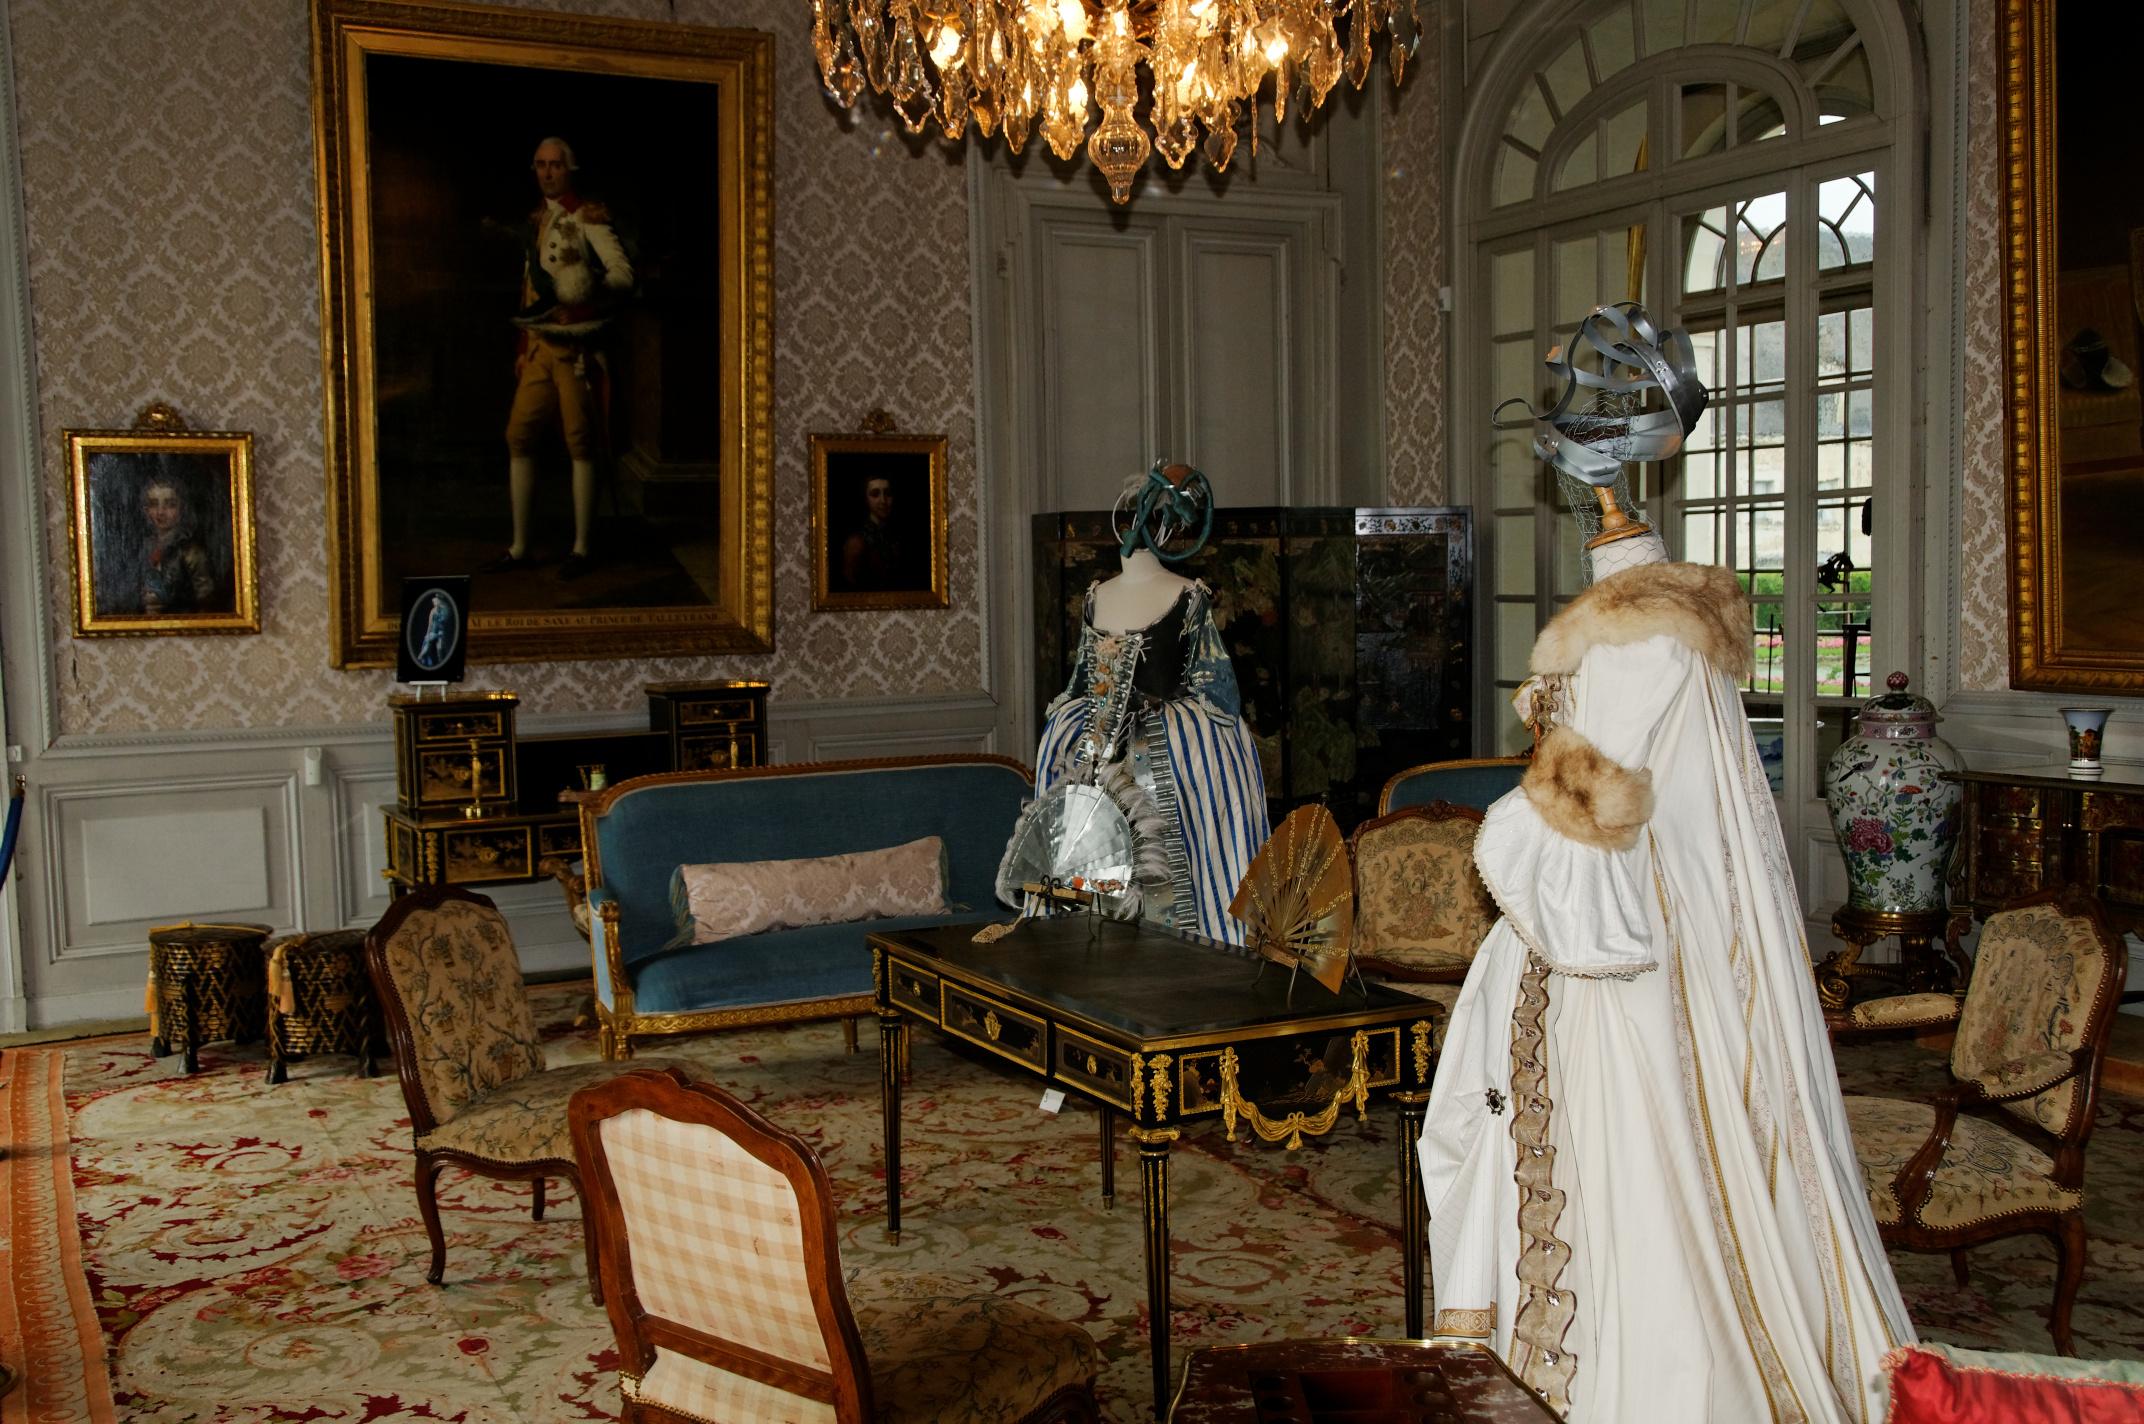 File:Château de Valençay Salon Bleu.jpg - Wikimedia Commons